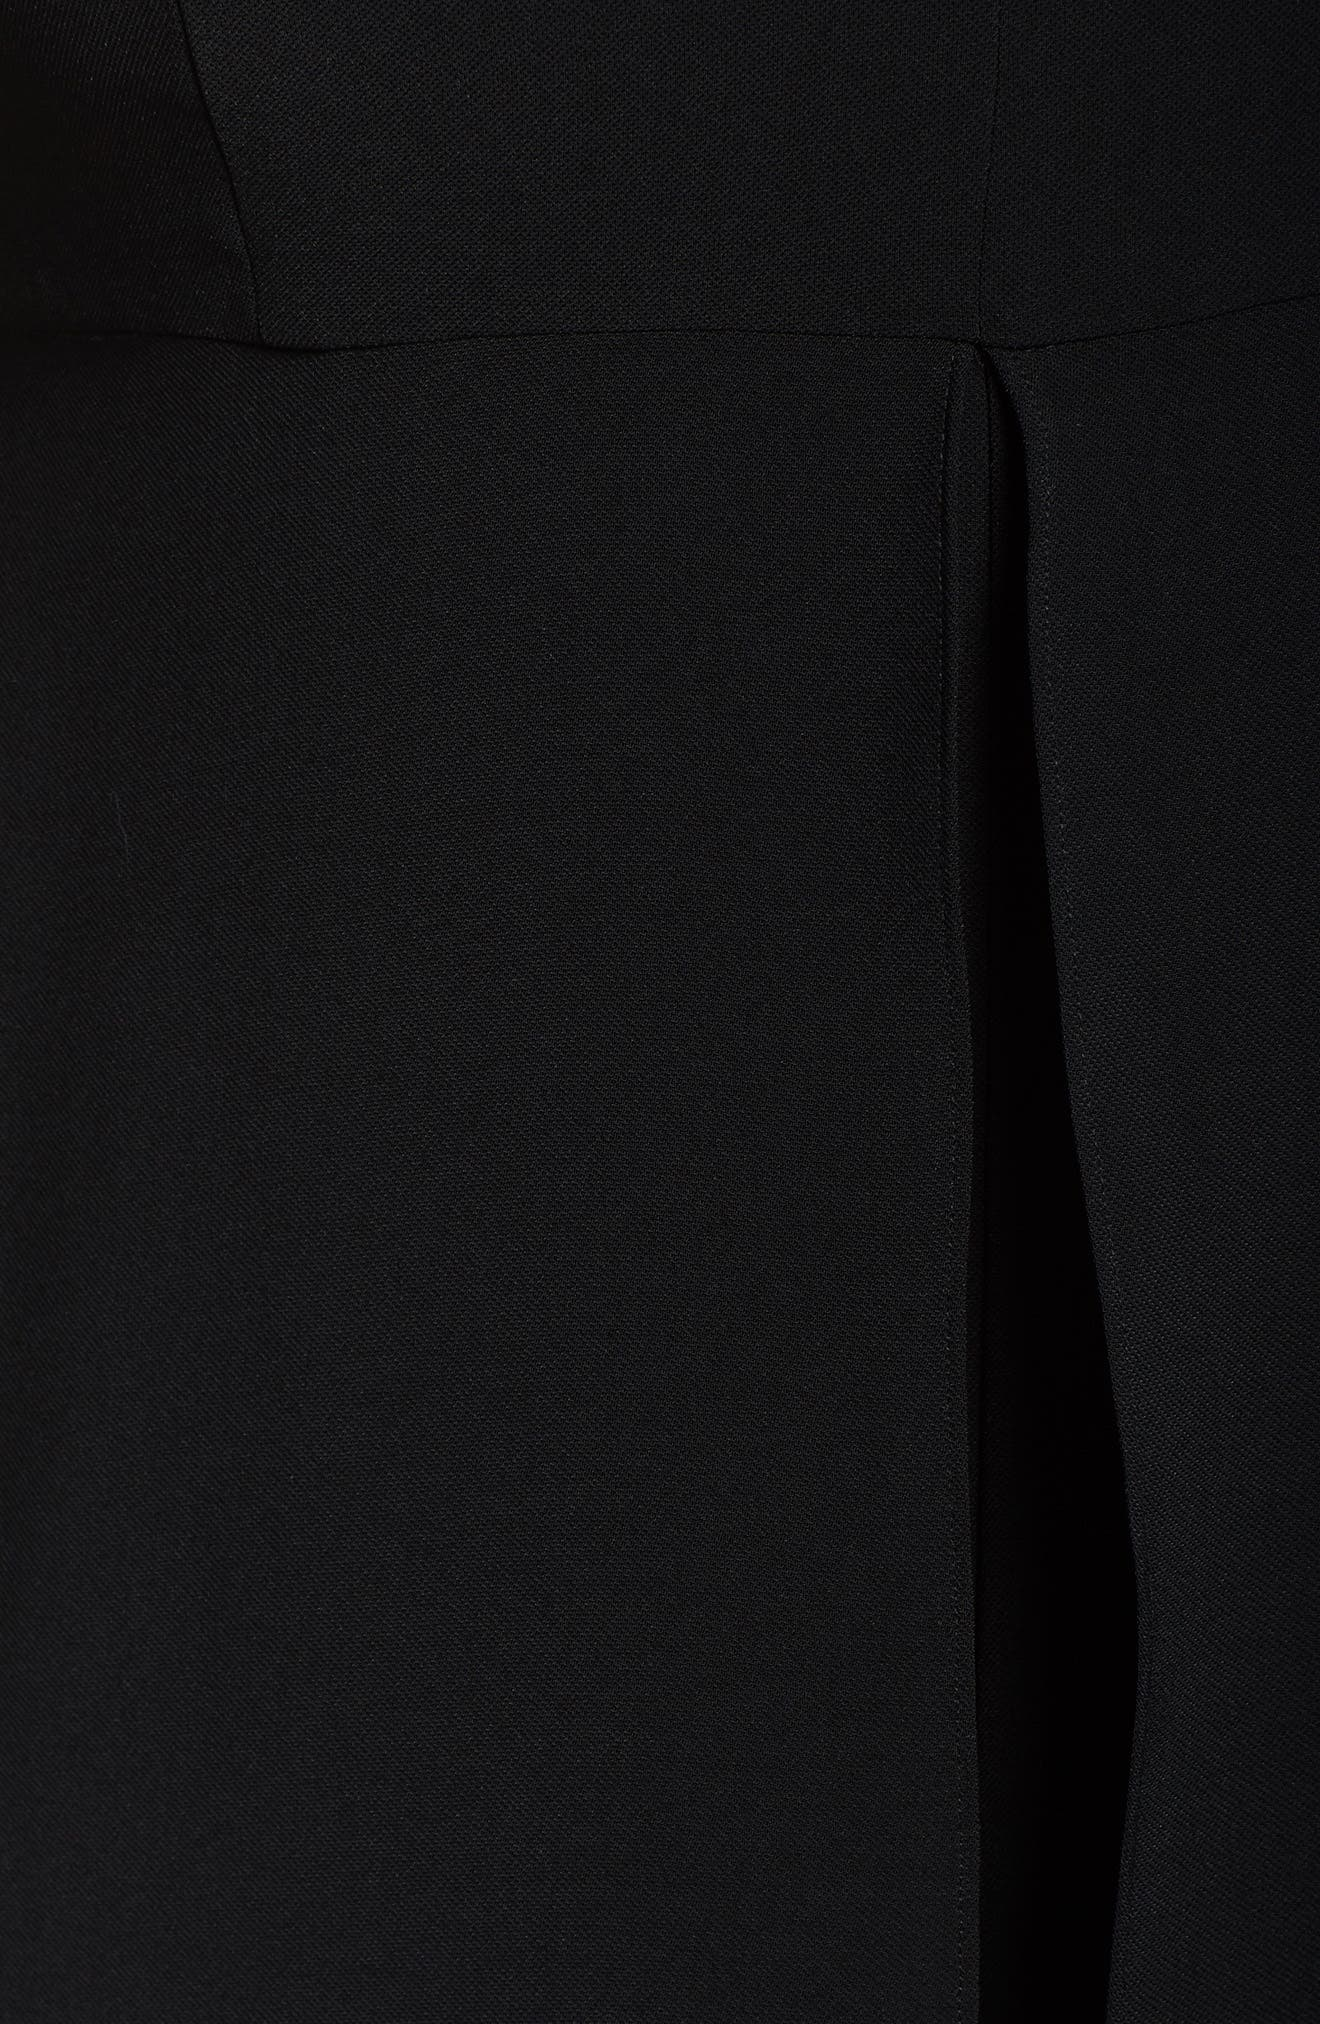 V-Neck Chiffon Overlay Jumpsuit,                             Alternate thumbnail 5, color,                             BLACK